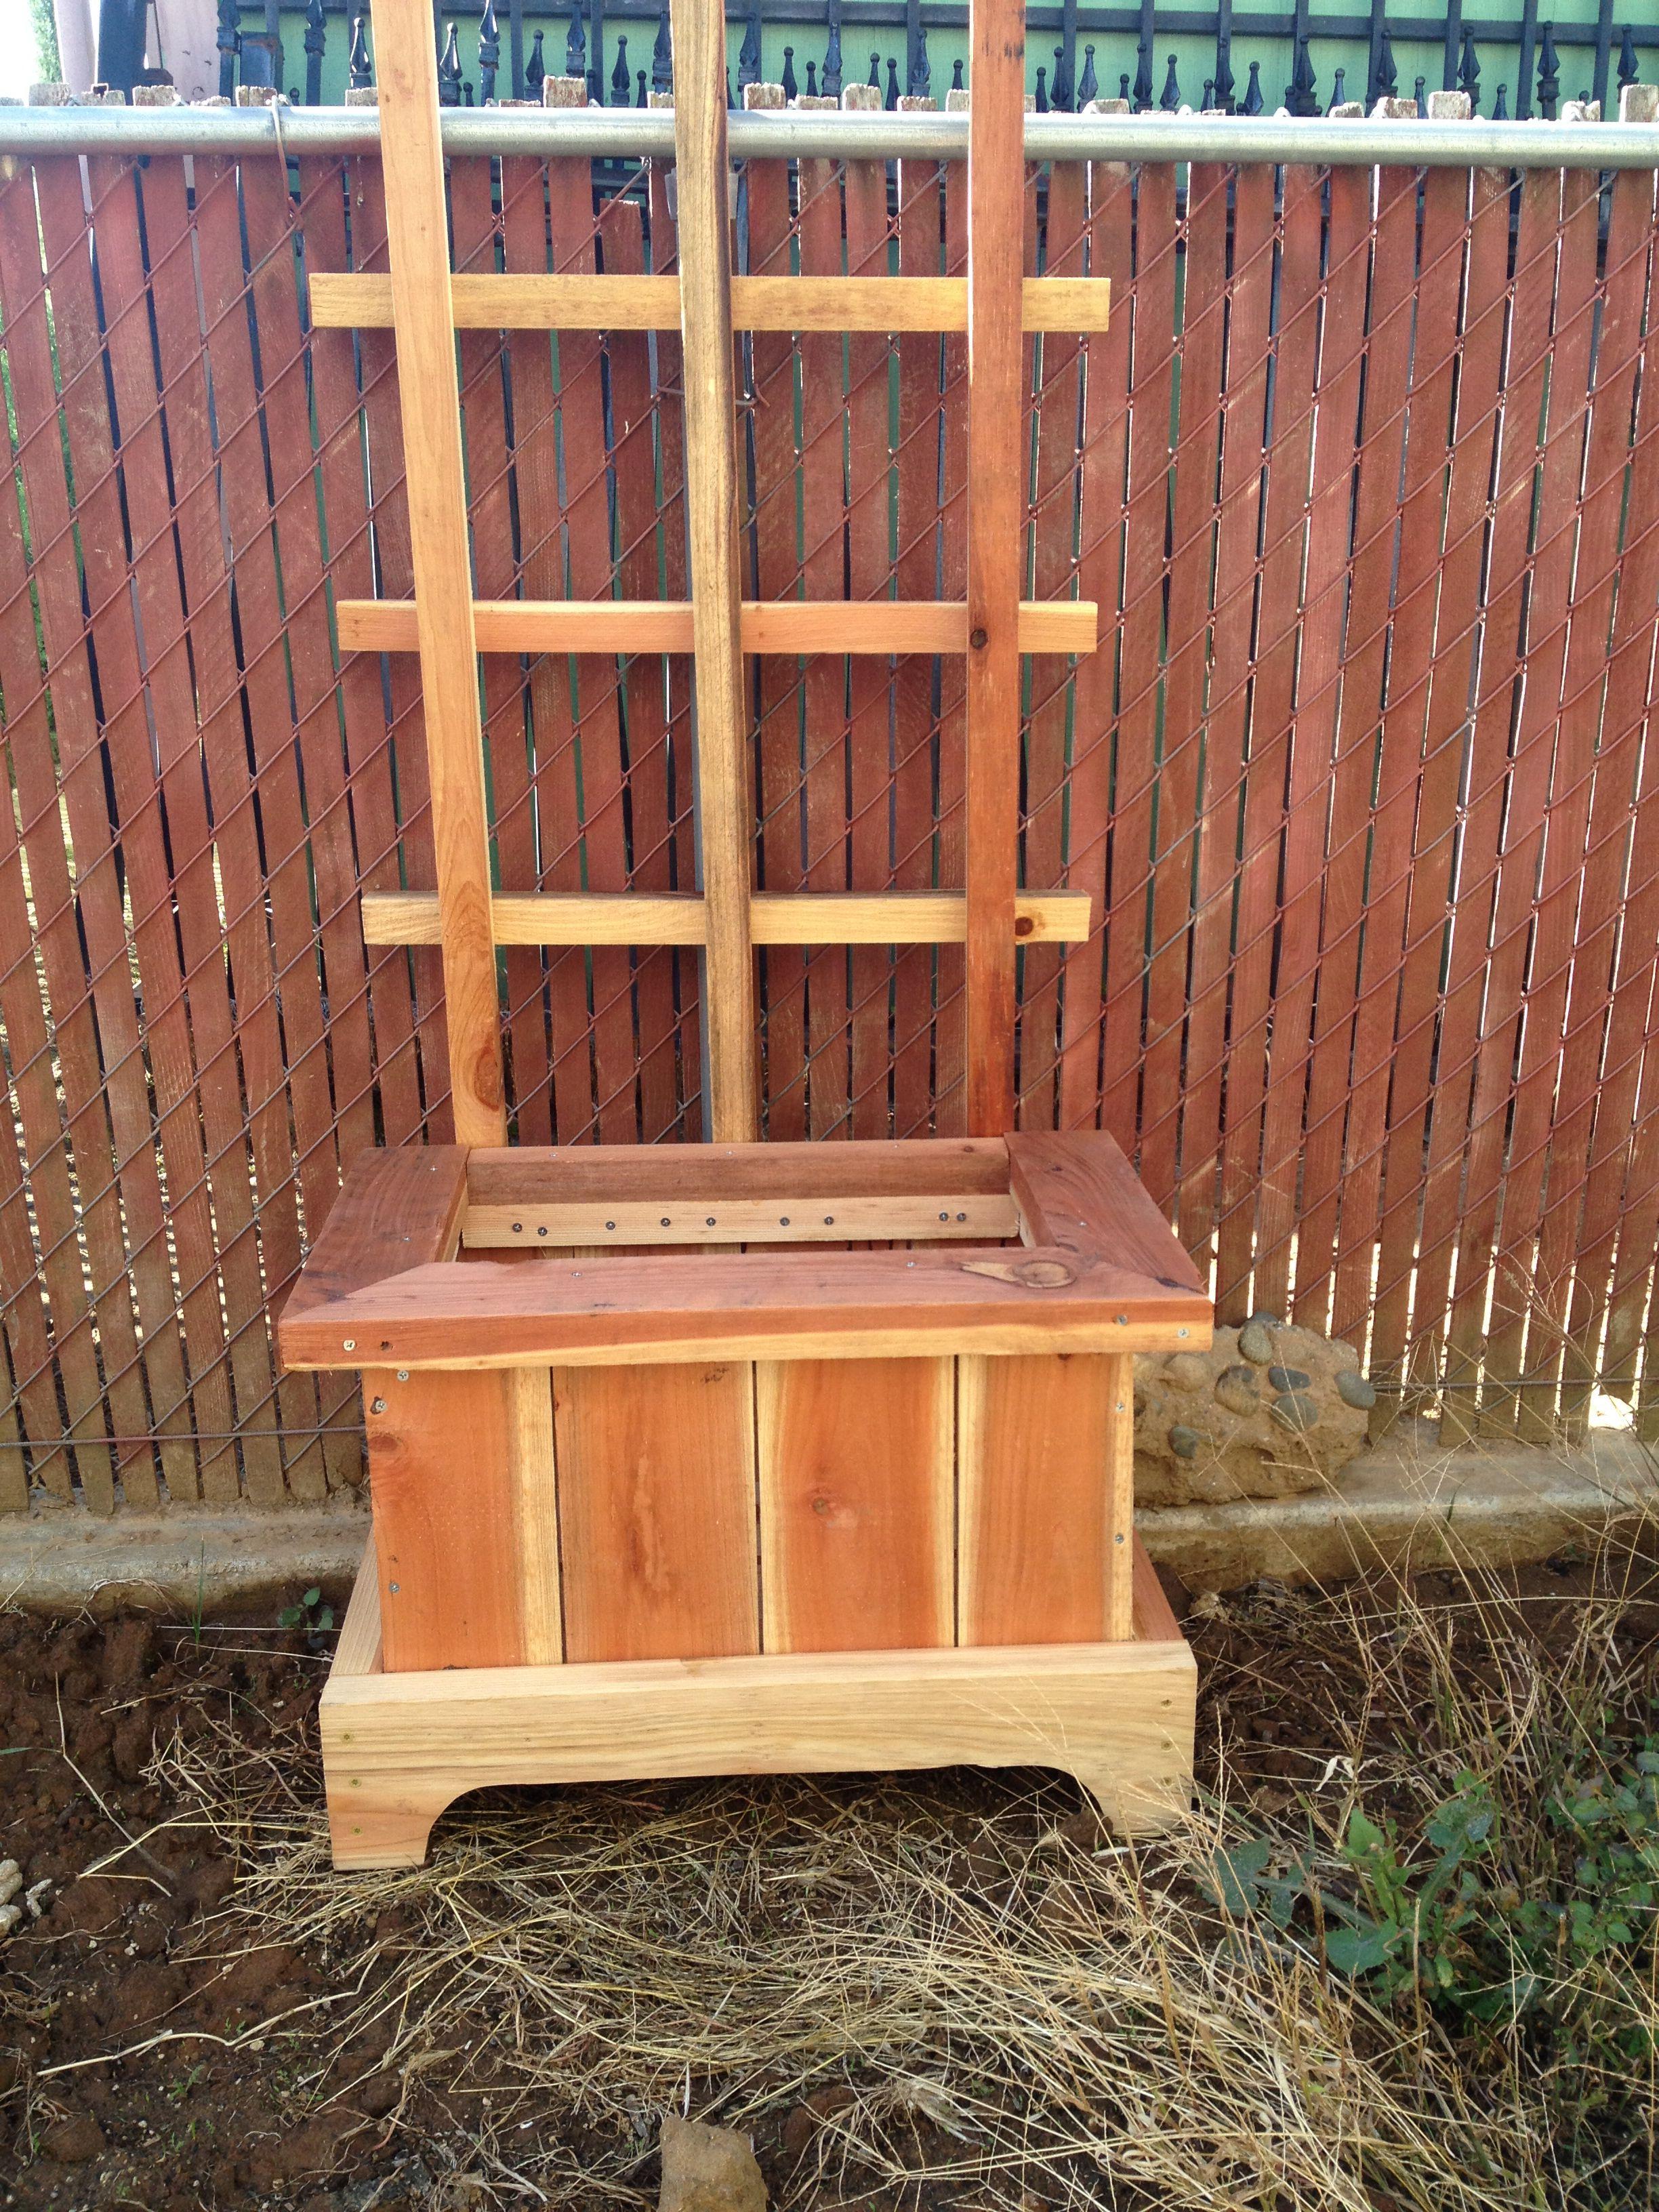 Garden decor trellis  Planter box with trellis  Back Yard Decorations  Pinterest